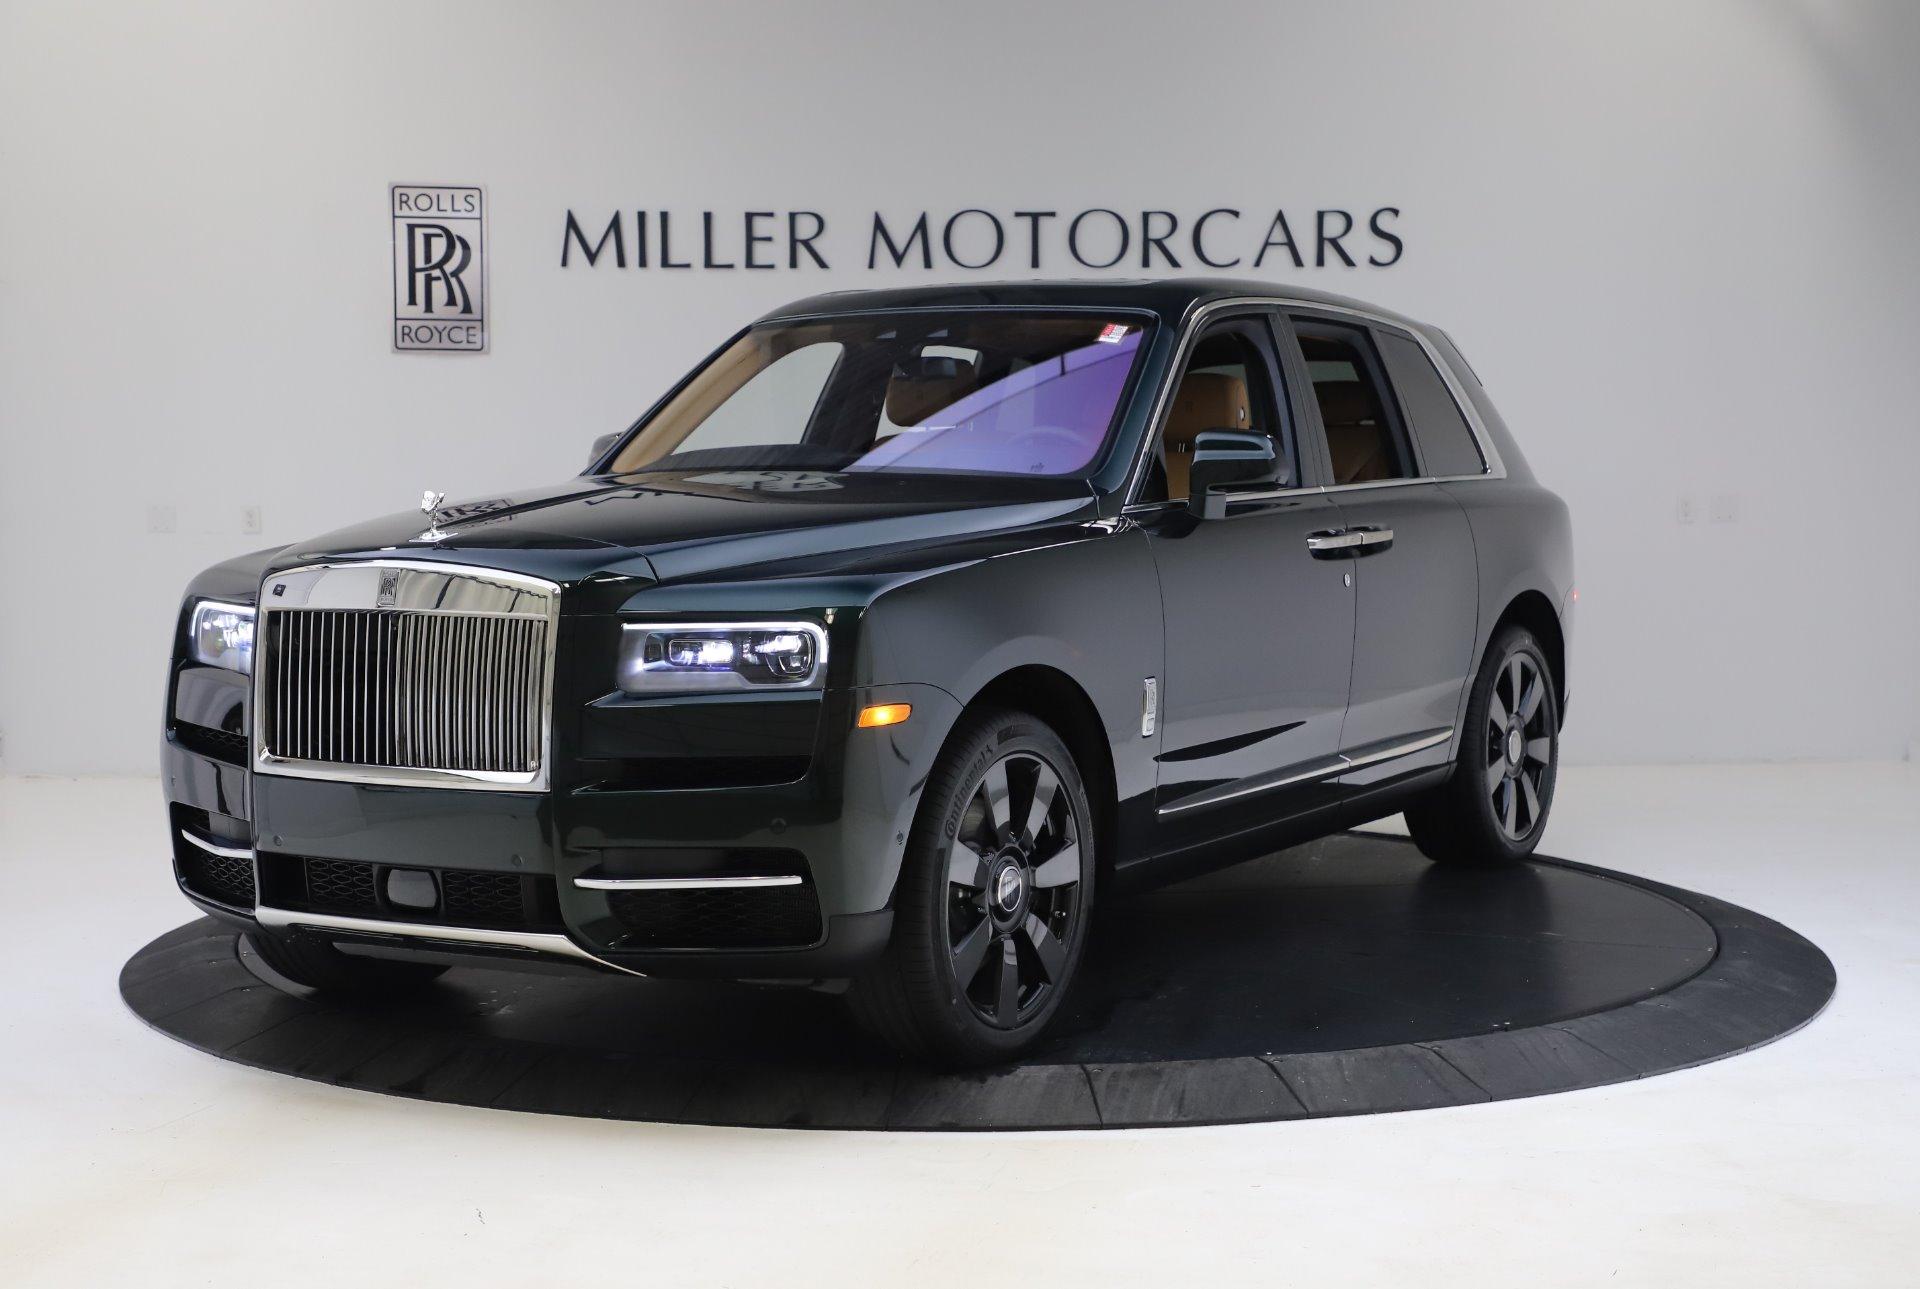 New 2020 Rolls Royce Cullinan For Sale 348 975 Miller